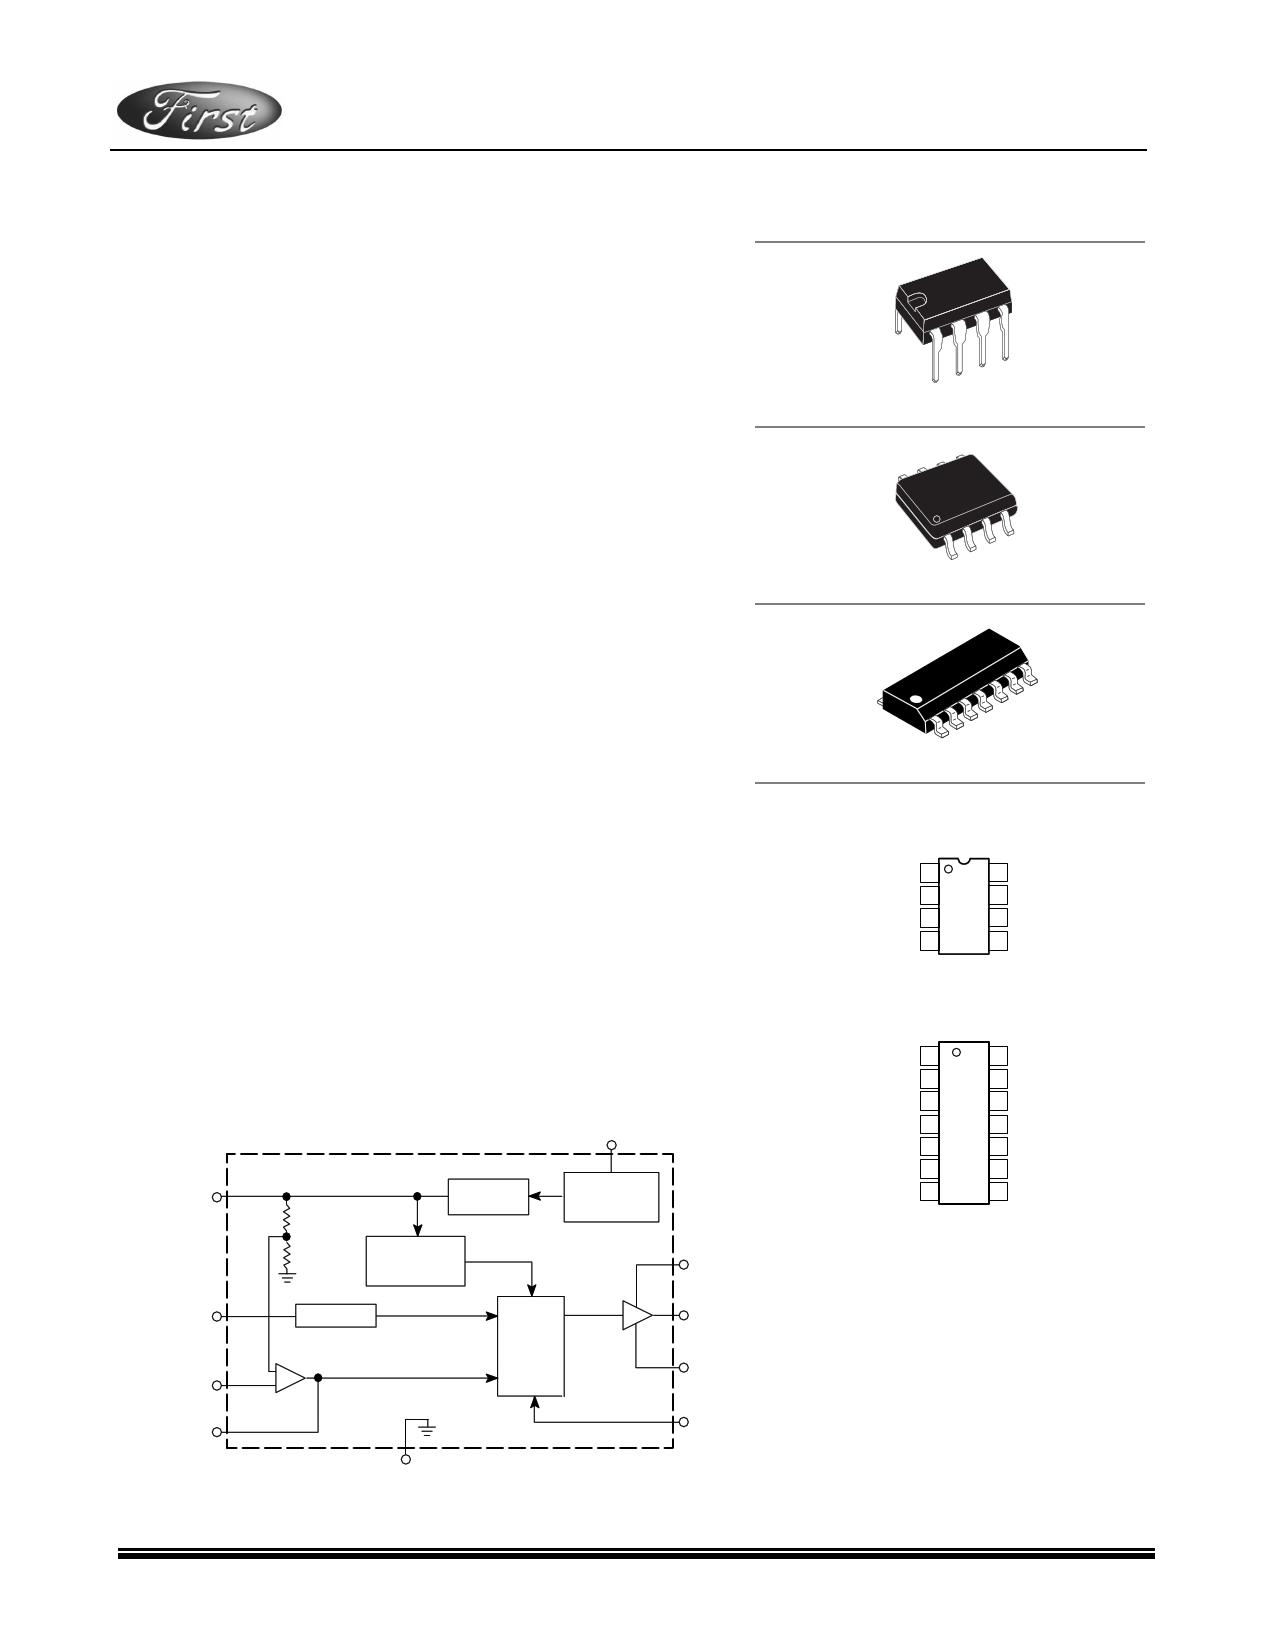 UC3842B Datasheet